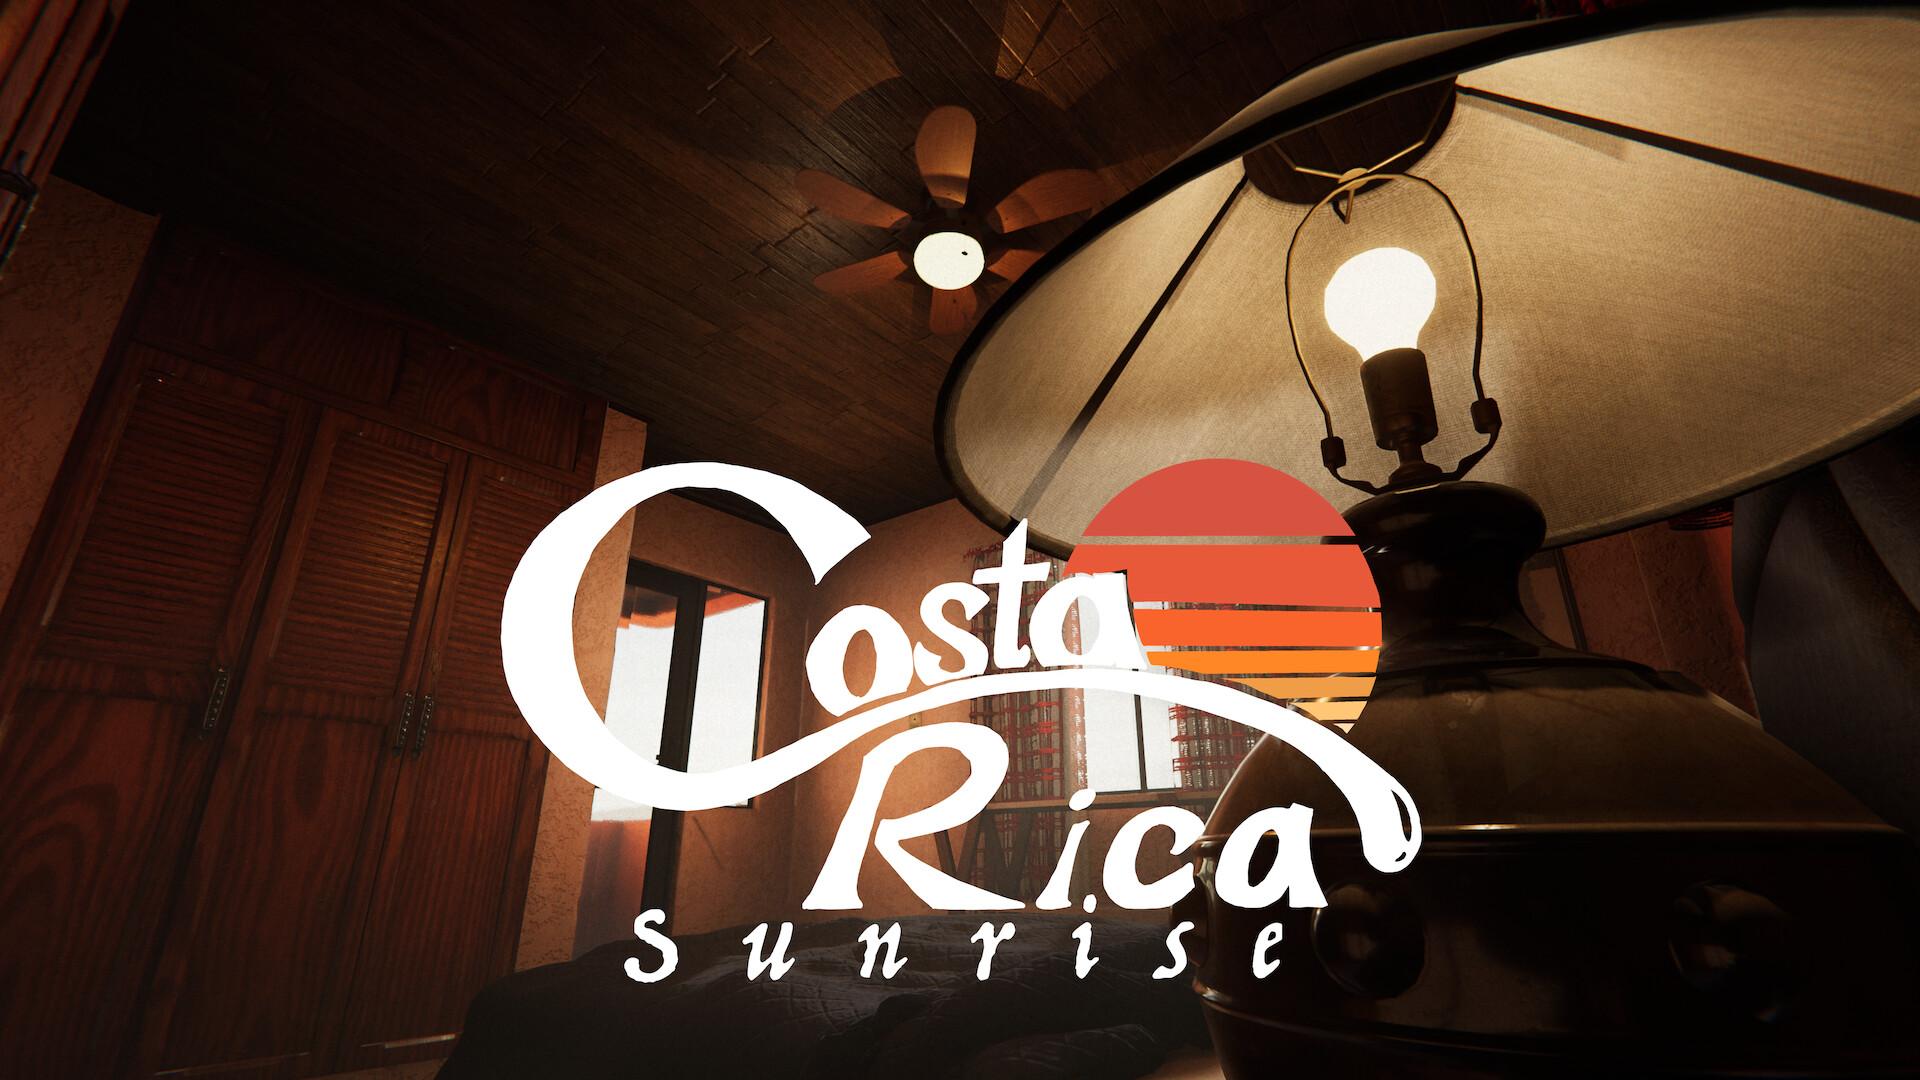 Costa Rican Sunrise